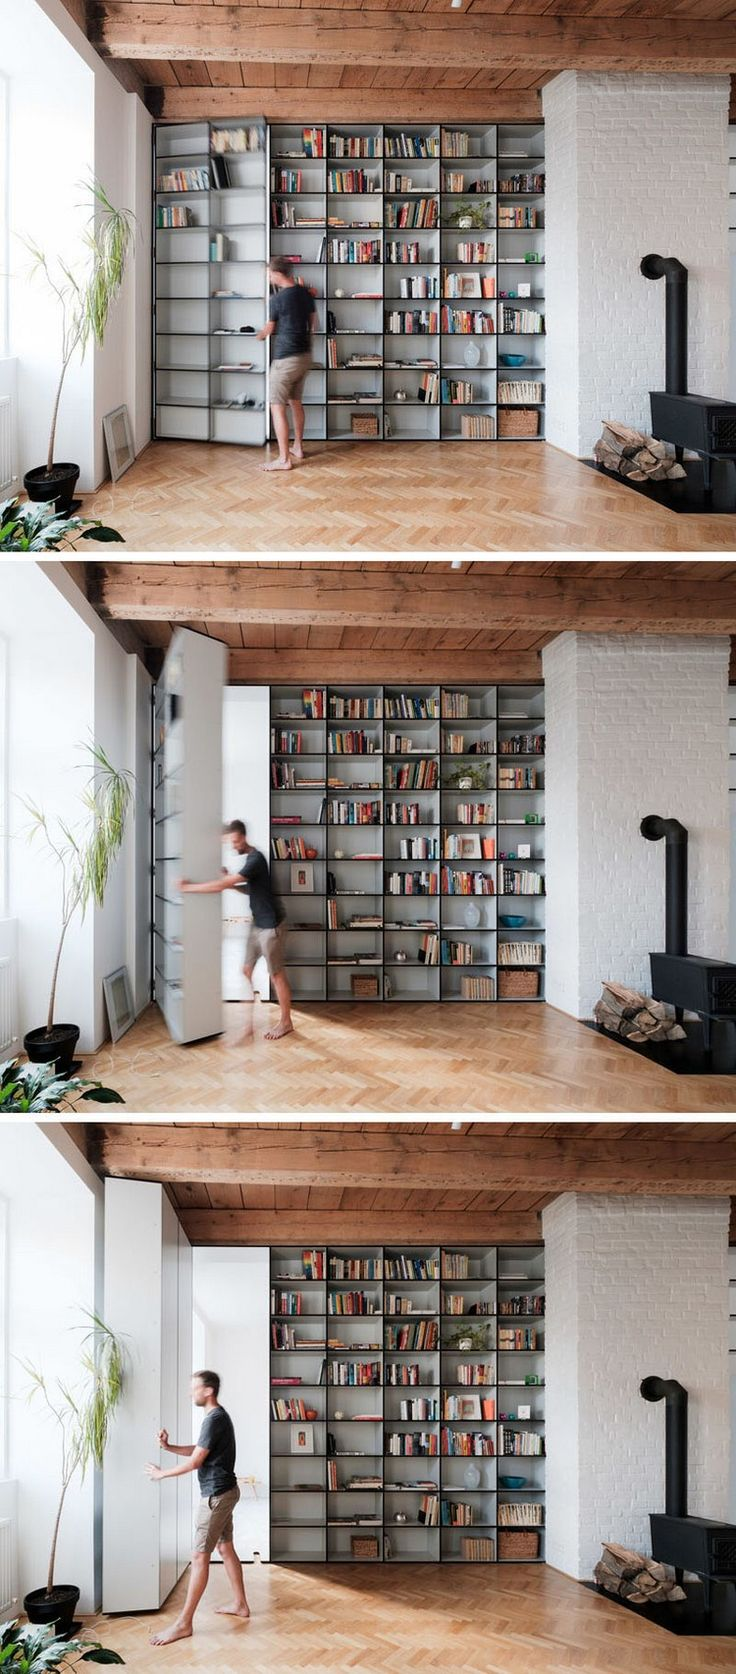 porte biblioth que cach e id es am nagement id es portes pinterest cacher am nagement et. Black Bedroom Furniture Sets. Home Design Ideas